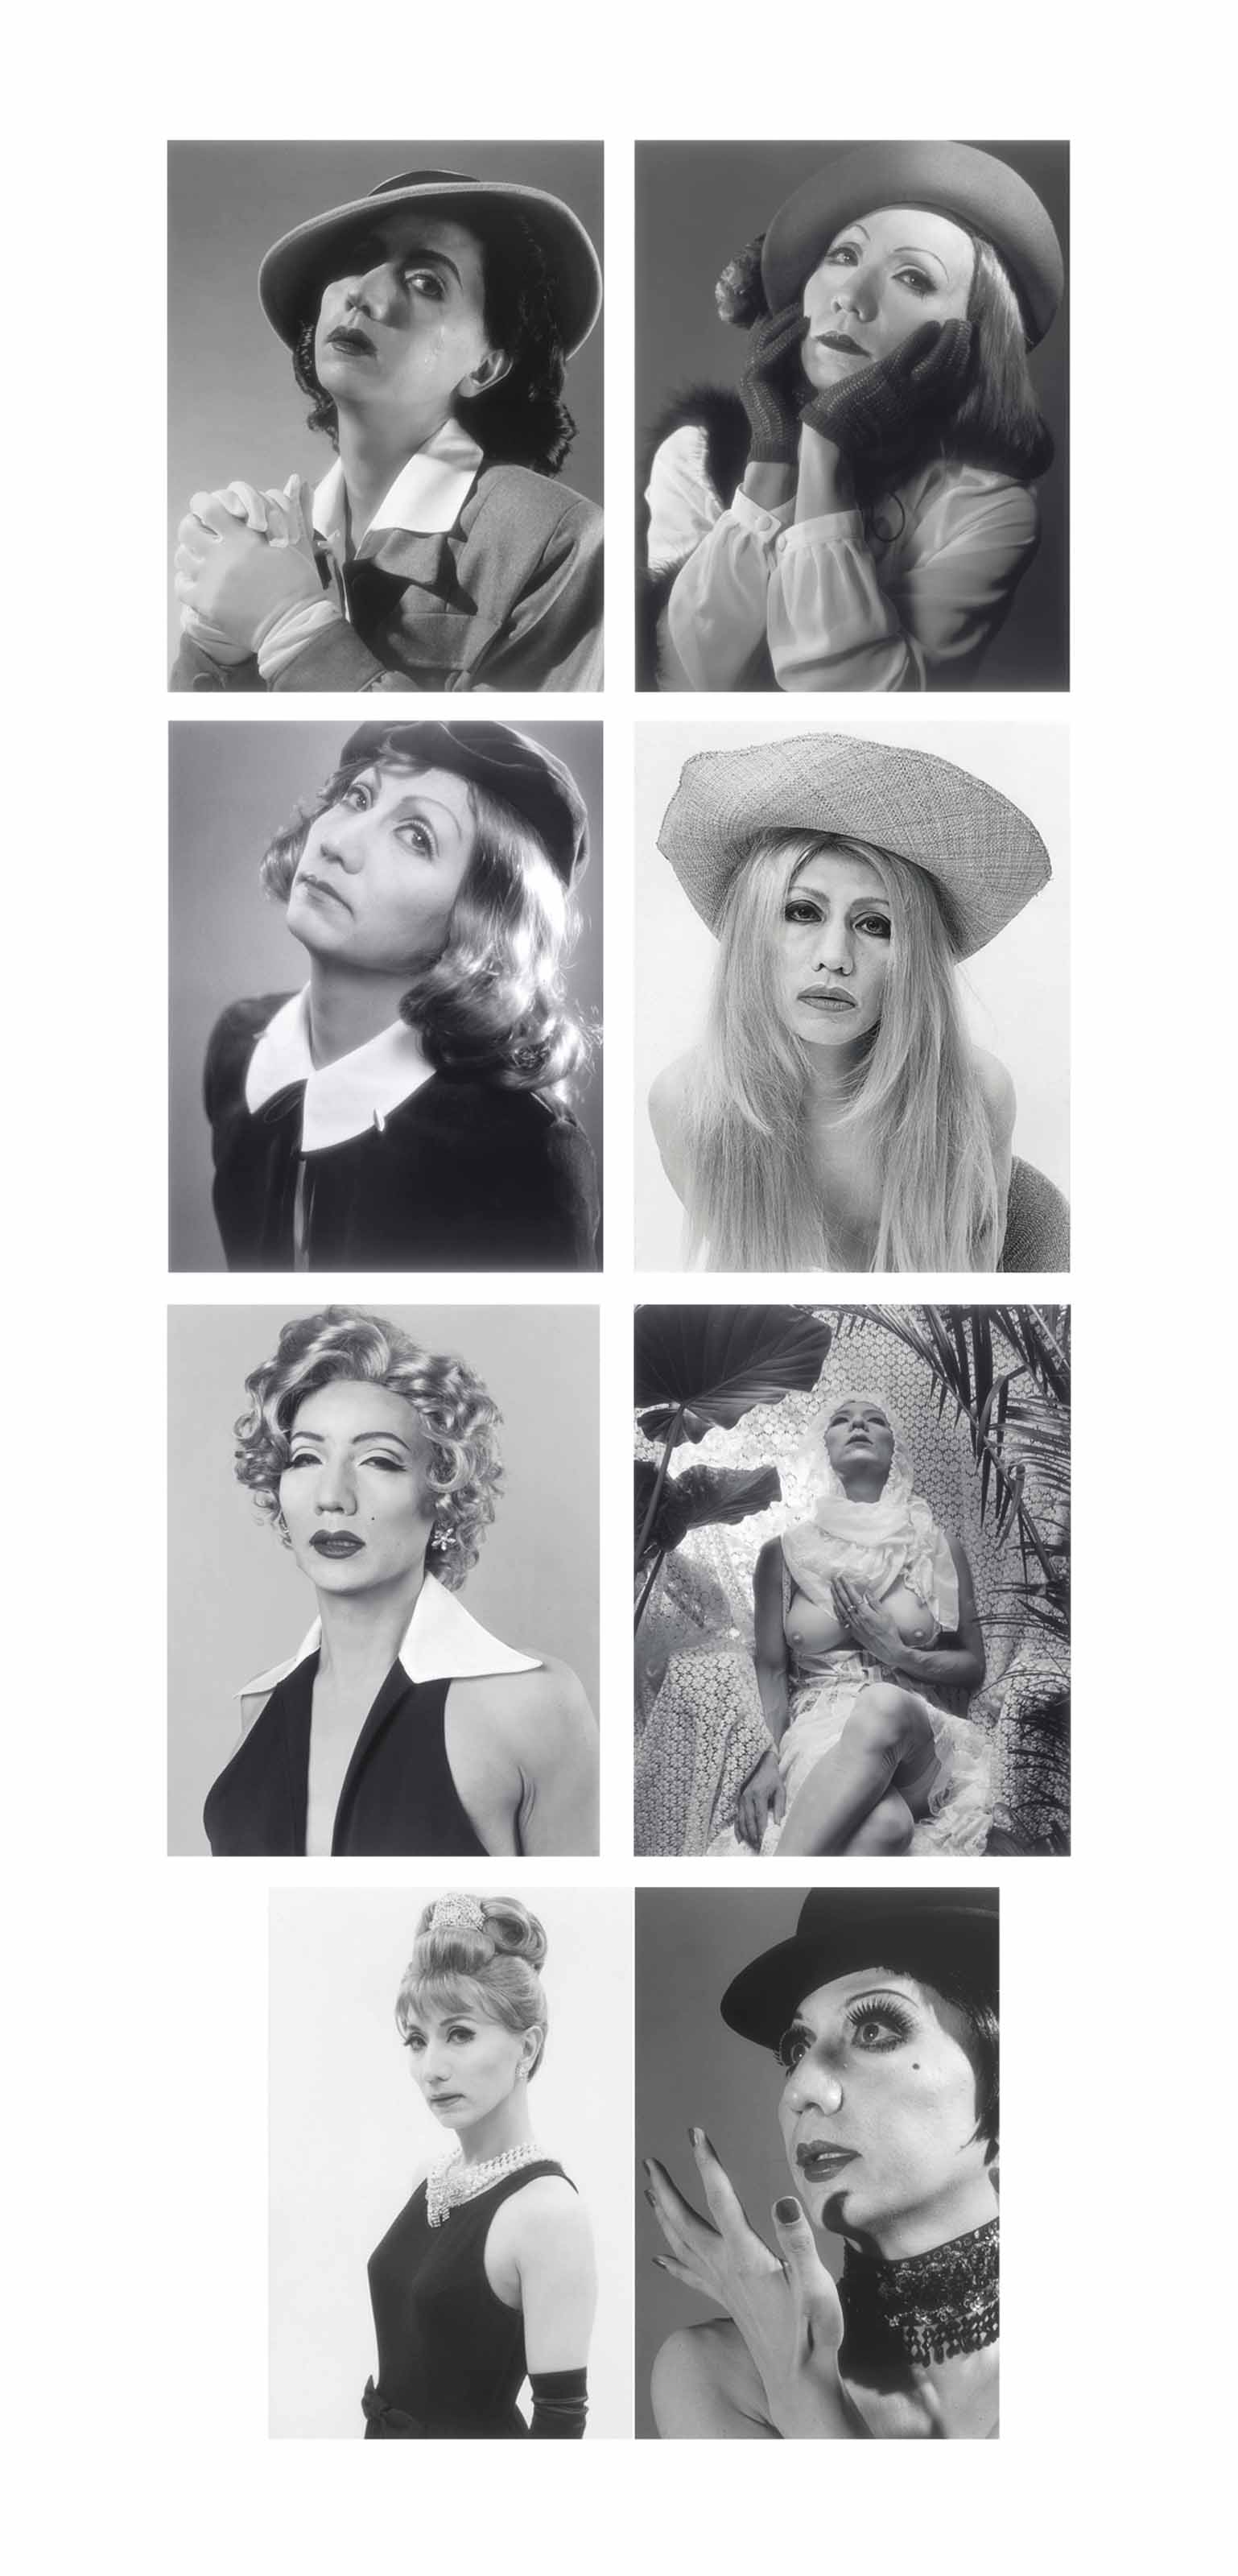 Self Portrait–After Ingrid Bergman, Greta Garbo 1, Greta Garbo 2, Brigitte Bardot 1, Marilyn Monroe, Sylvia Kristel, Audrey Hepburn 1, Liza Minelli 1